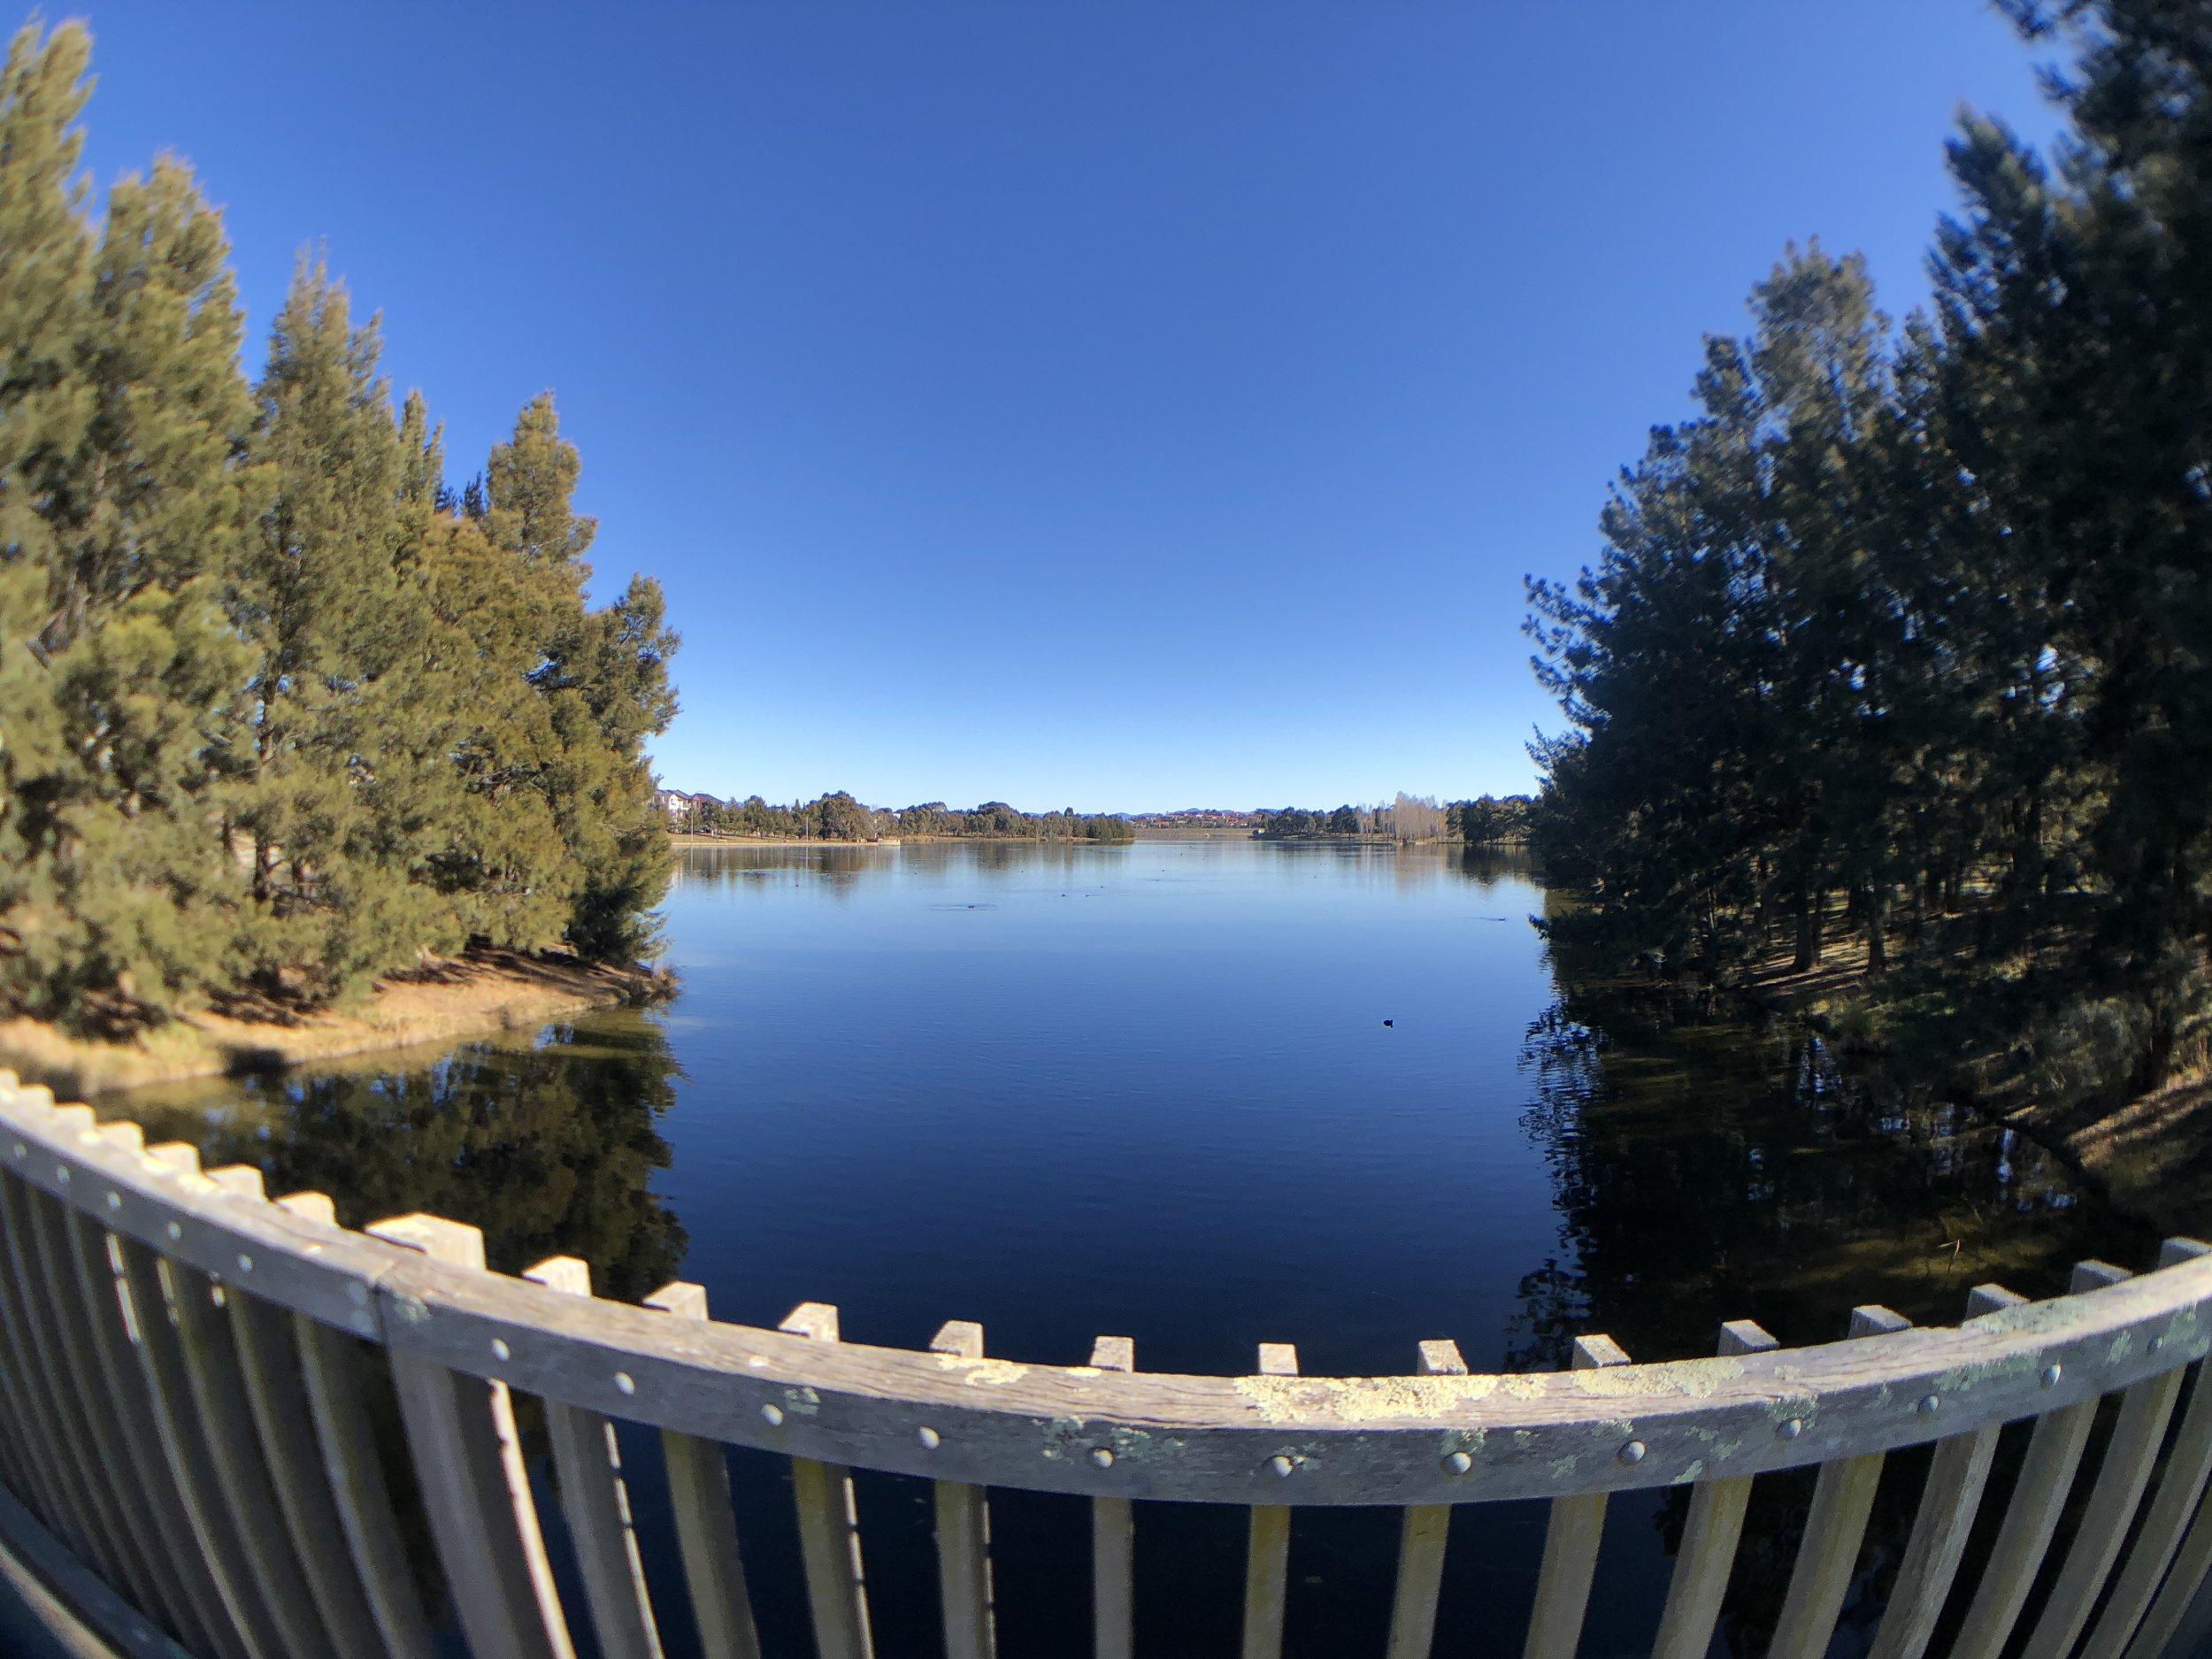 Landscape shot with wide-angle lens